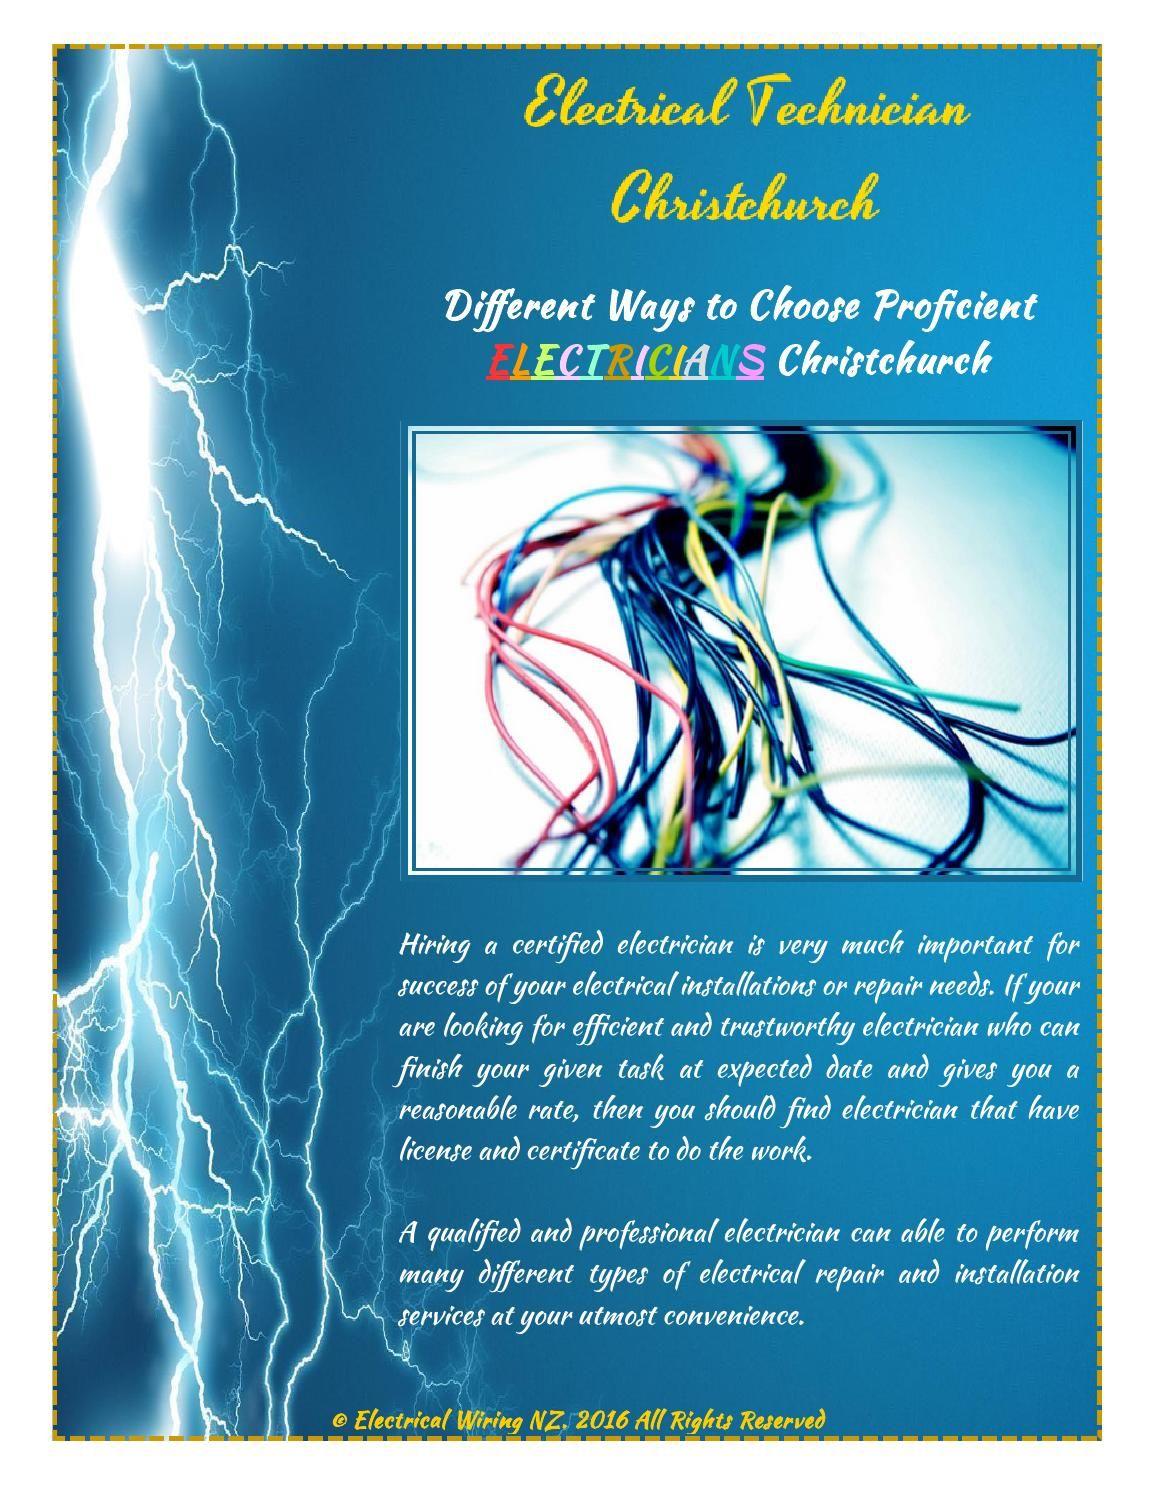 Different Ways to Choose Proficient Electricians Christchurch ...